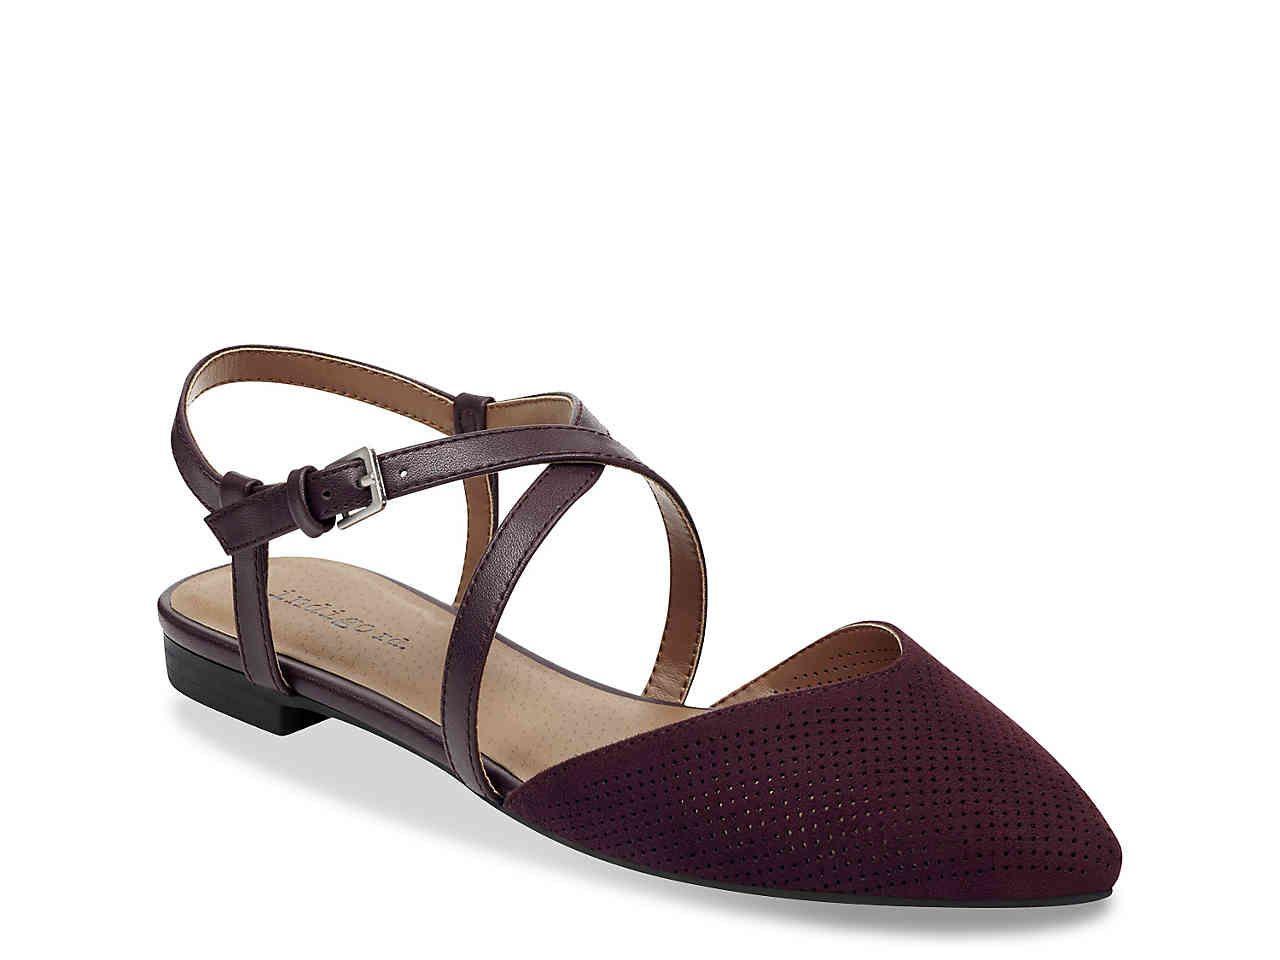 Indigo Rd. Genetic Flat | Flat shoes